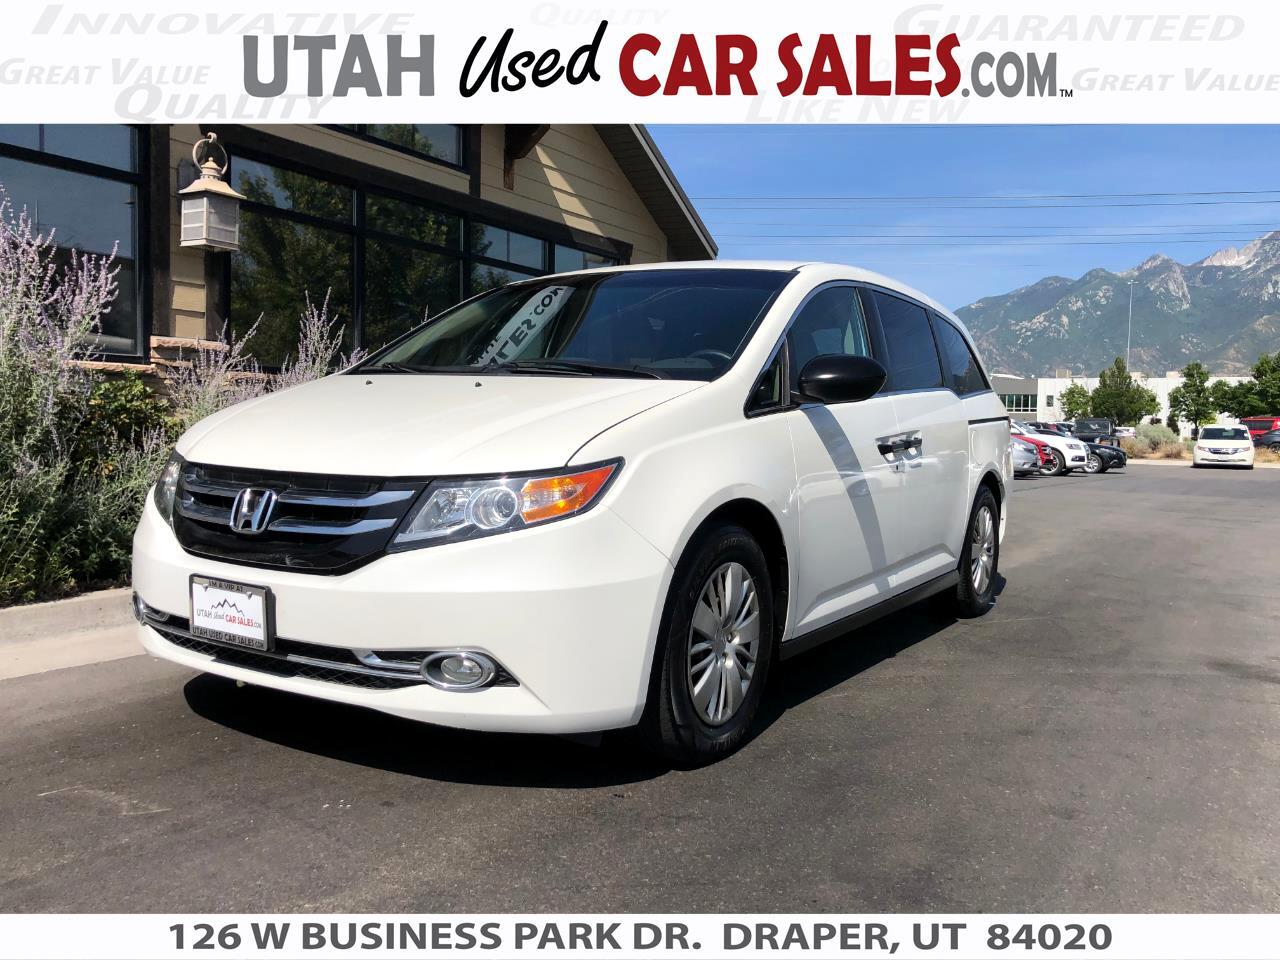 2014 Honda Odyssey 5dr LX